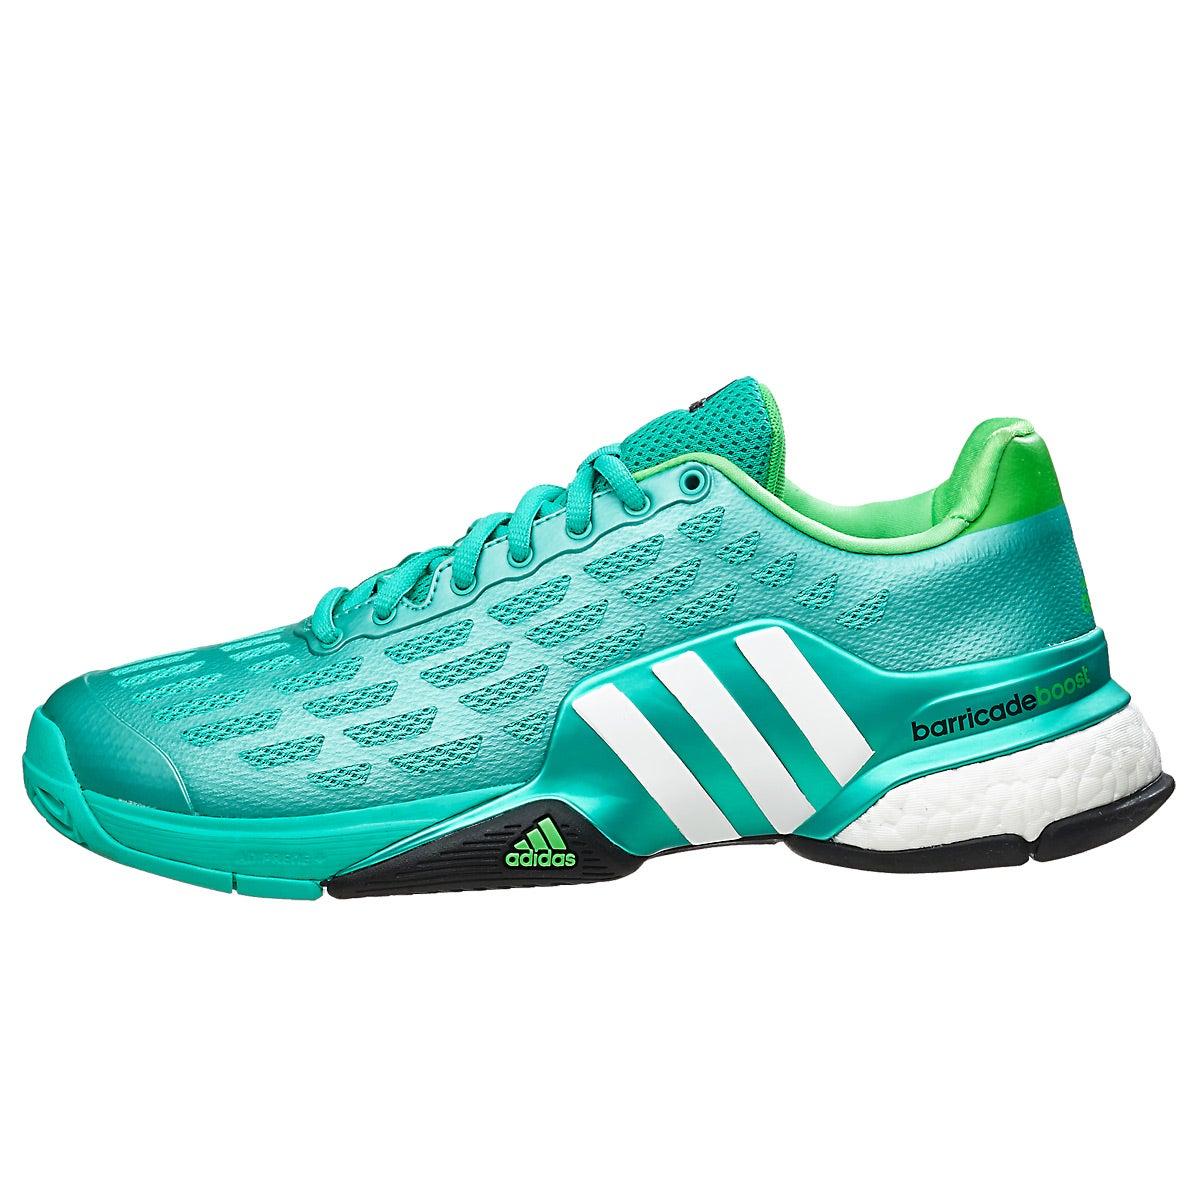 Mint Adidas Shoe